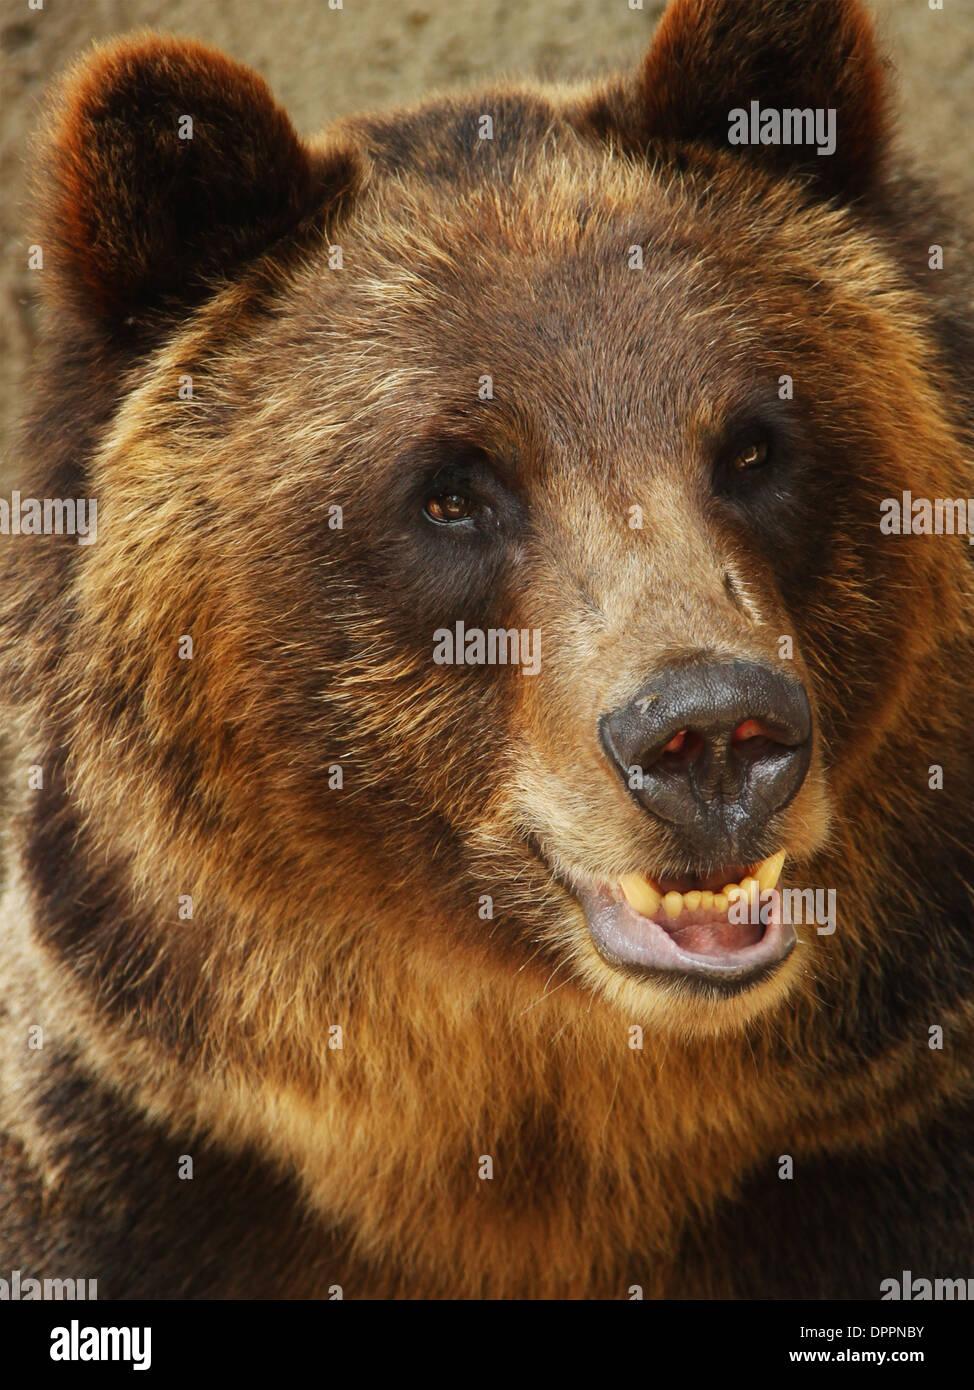 bear-cleveland-zoo-stockyards-cleveland-